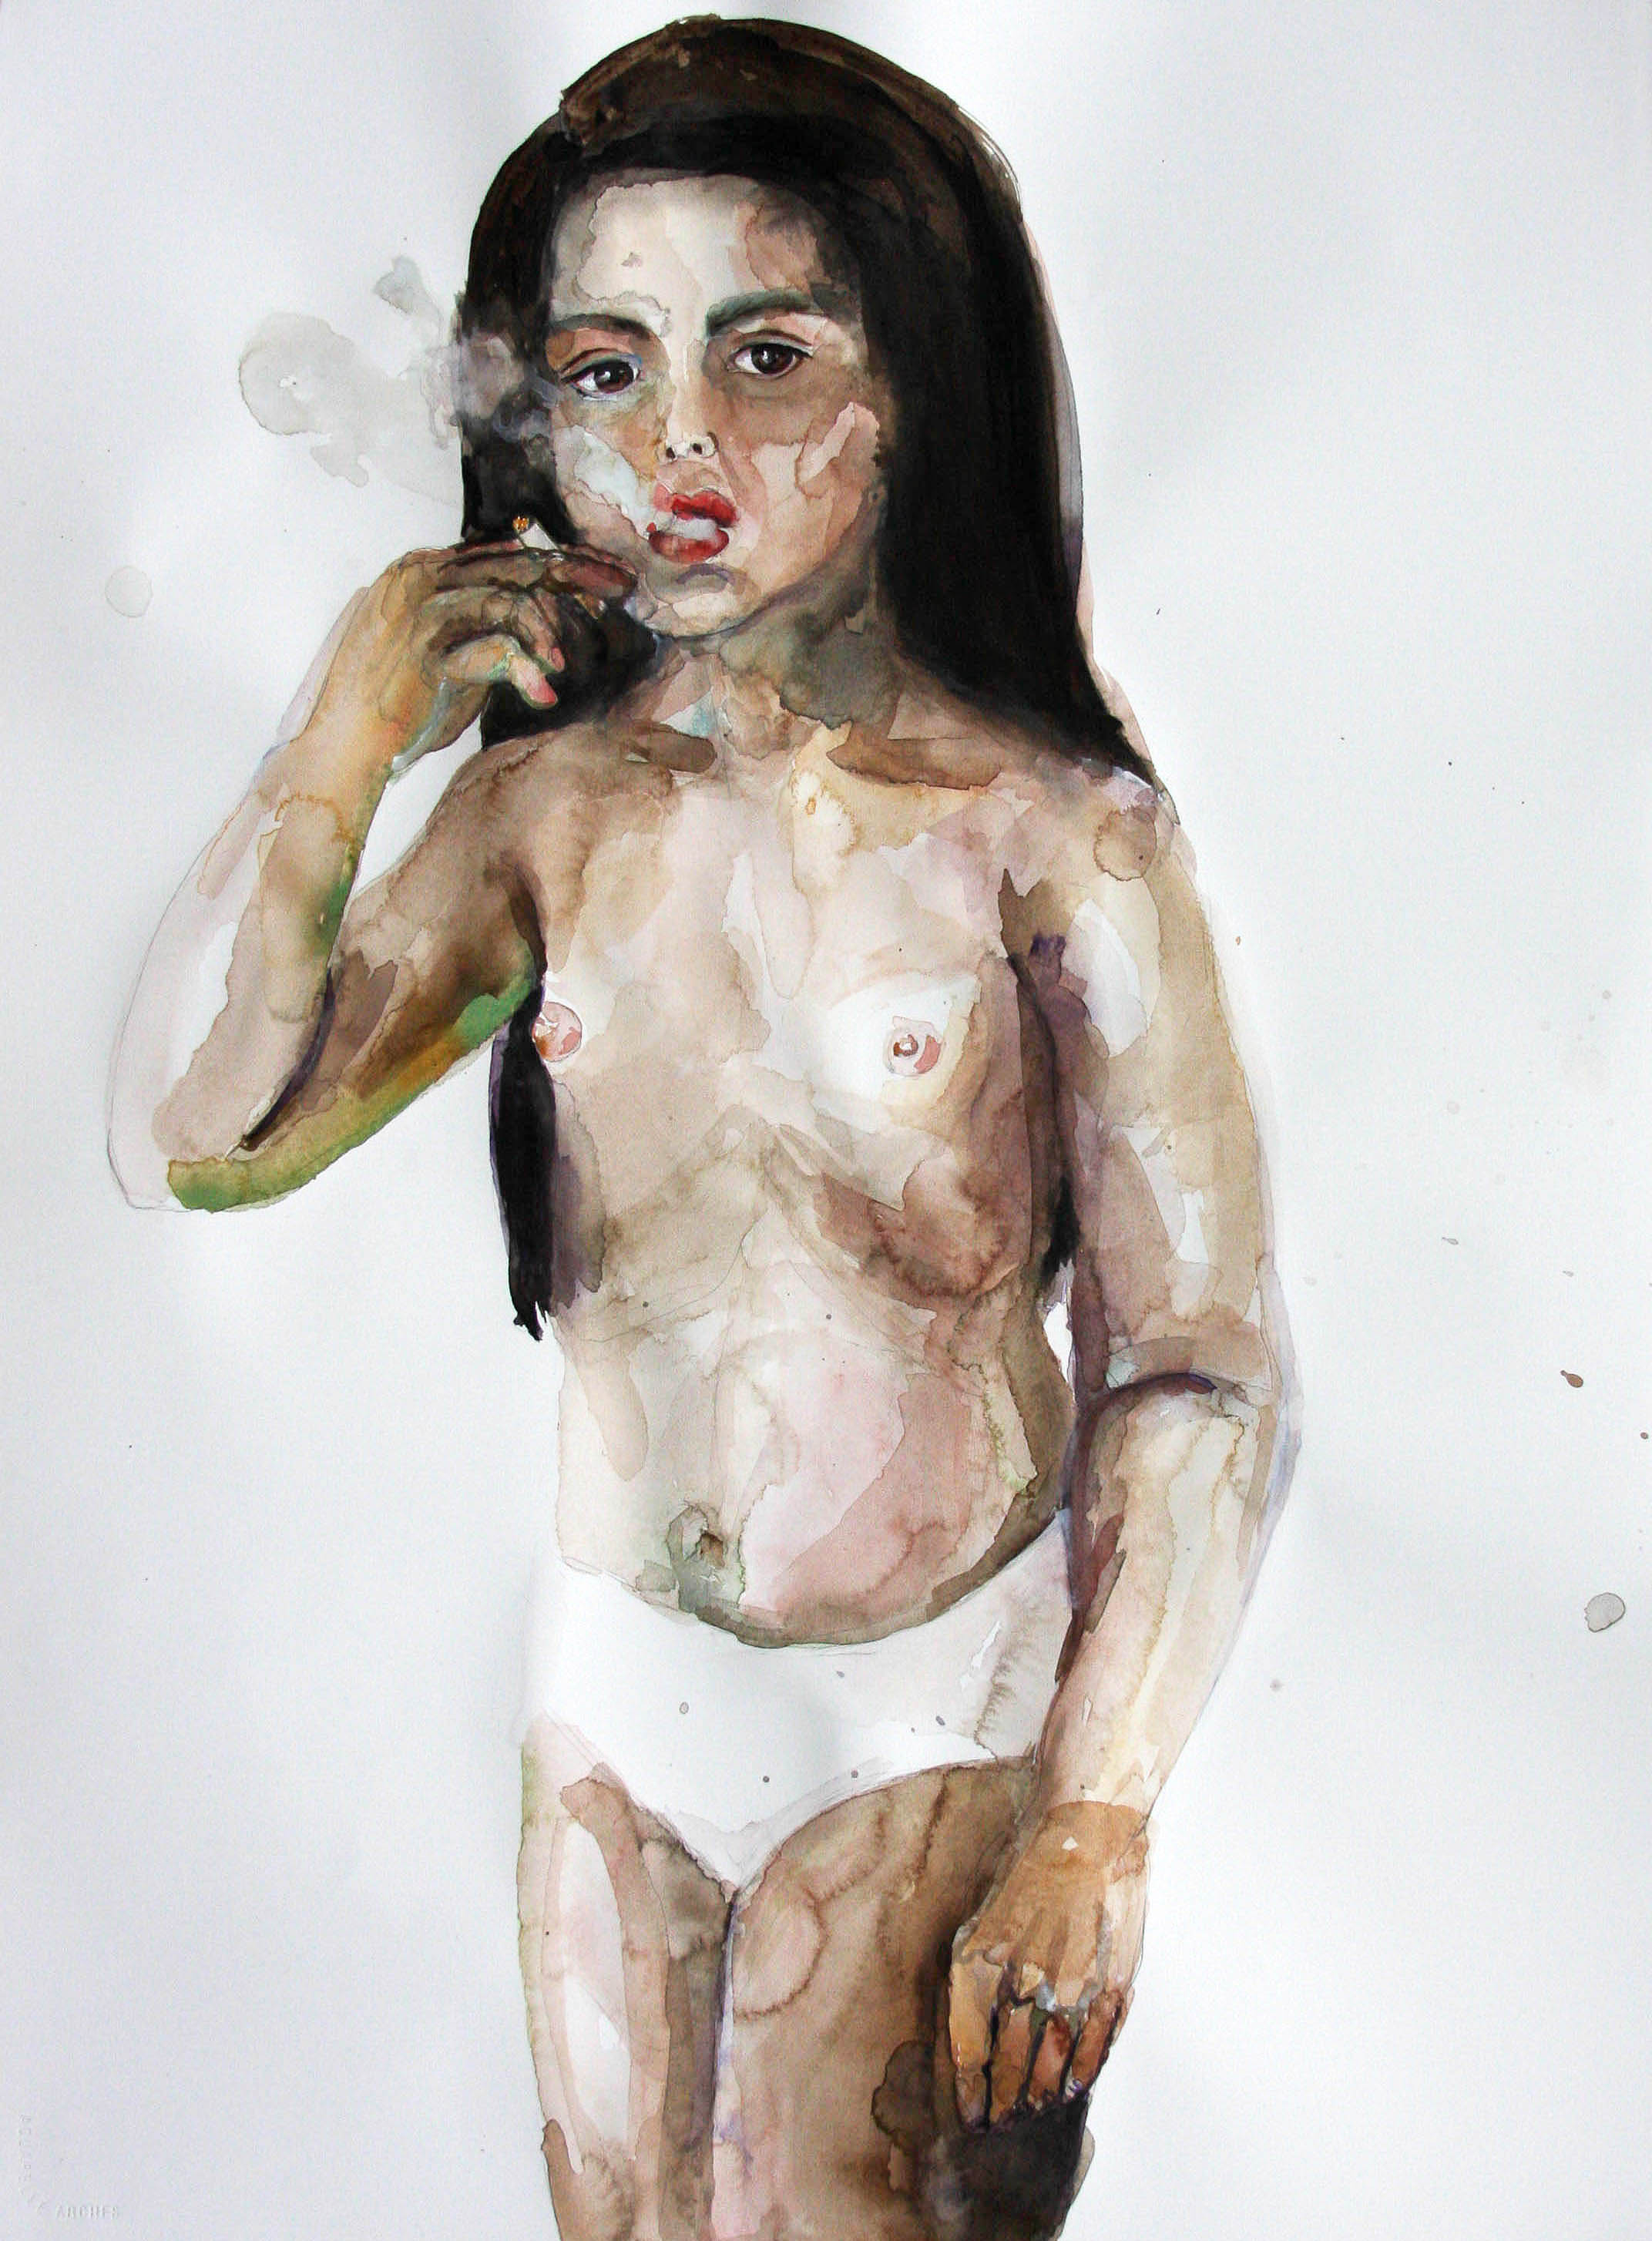 Fumando 4, 2010, Graphite and watercolor on paper, 30 x 22 in.